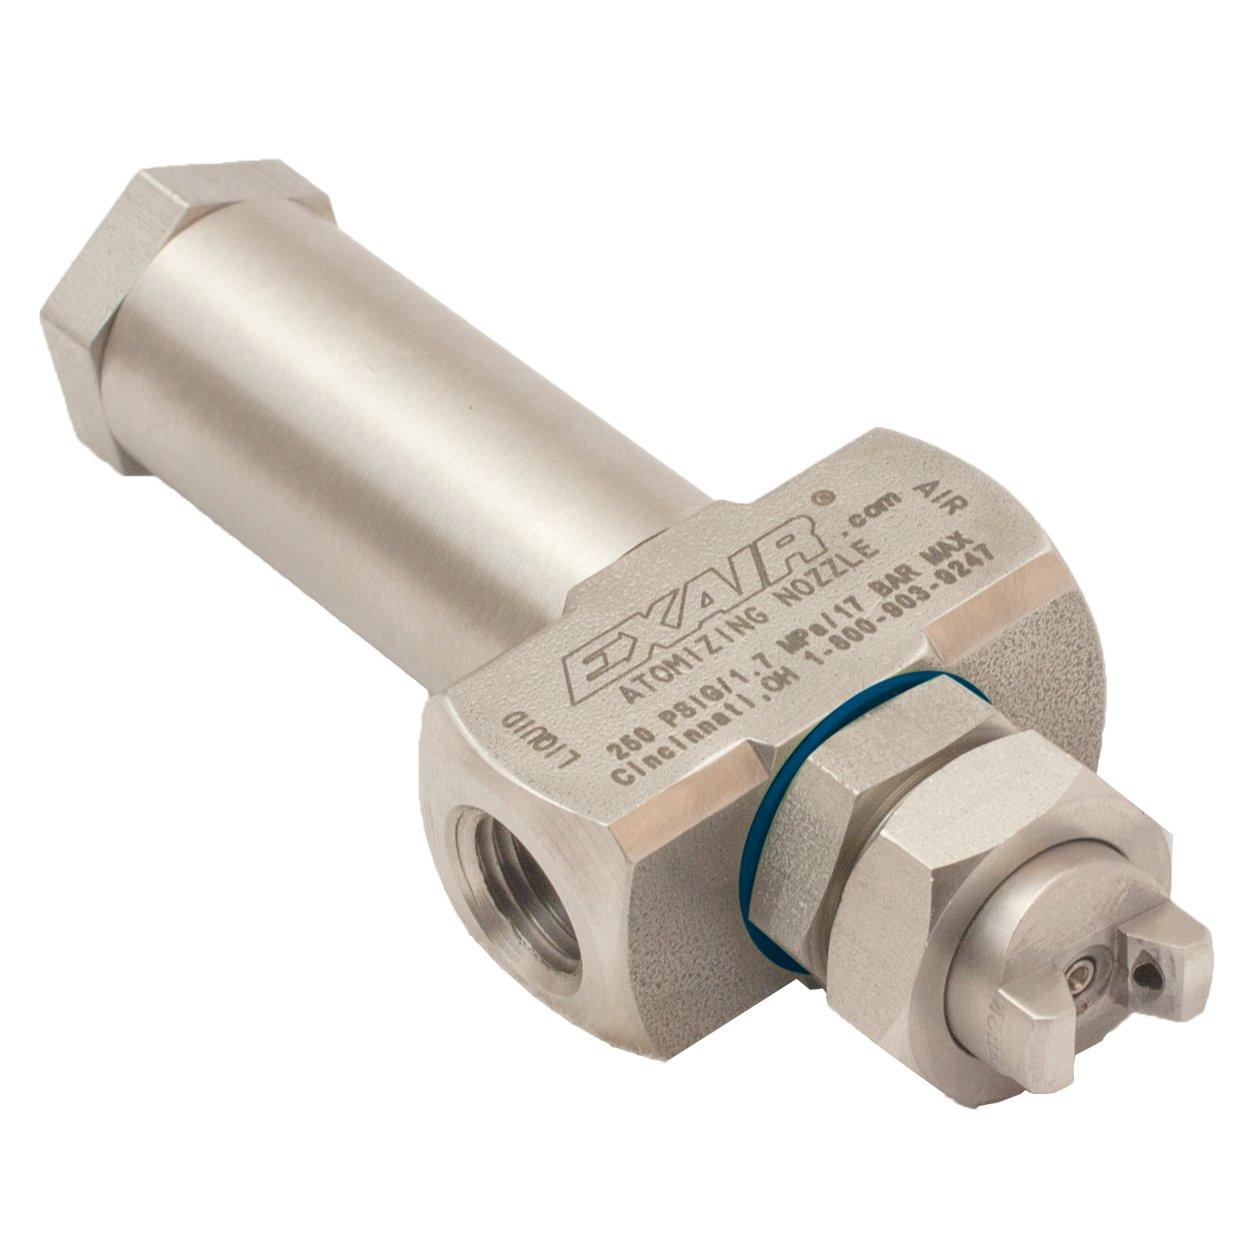 EXAIR EB2010SS No Drip Atomizing Nozzle, 3.8 GPH Maximum Flow Rate, 14.4 LPH Max